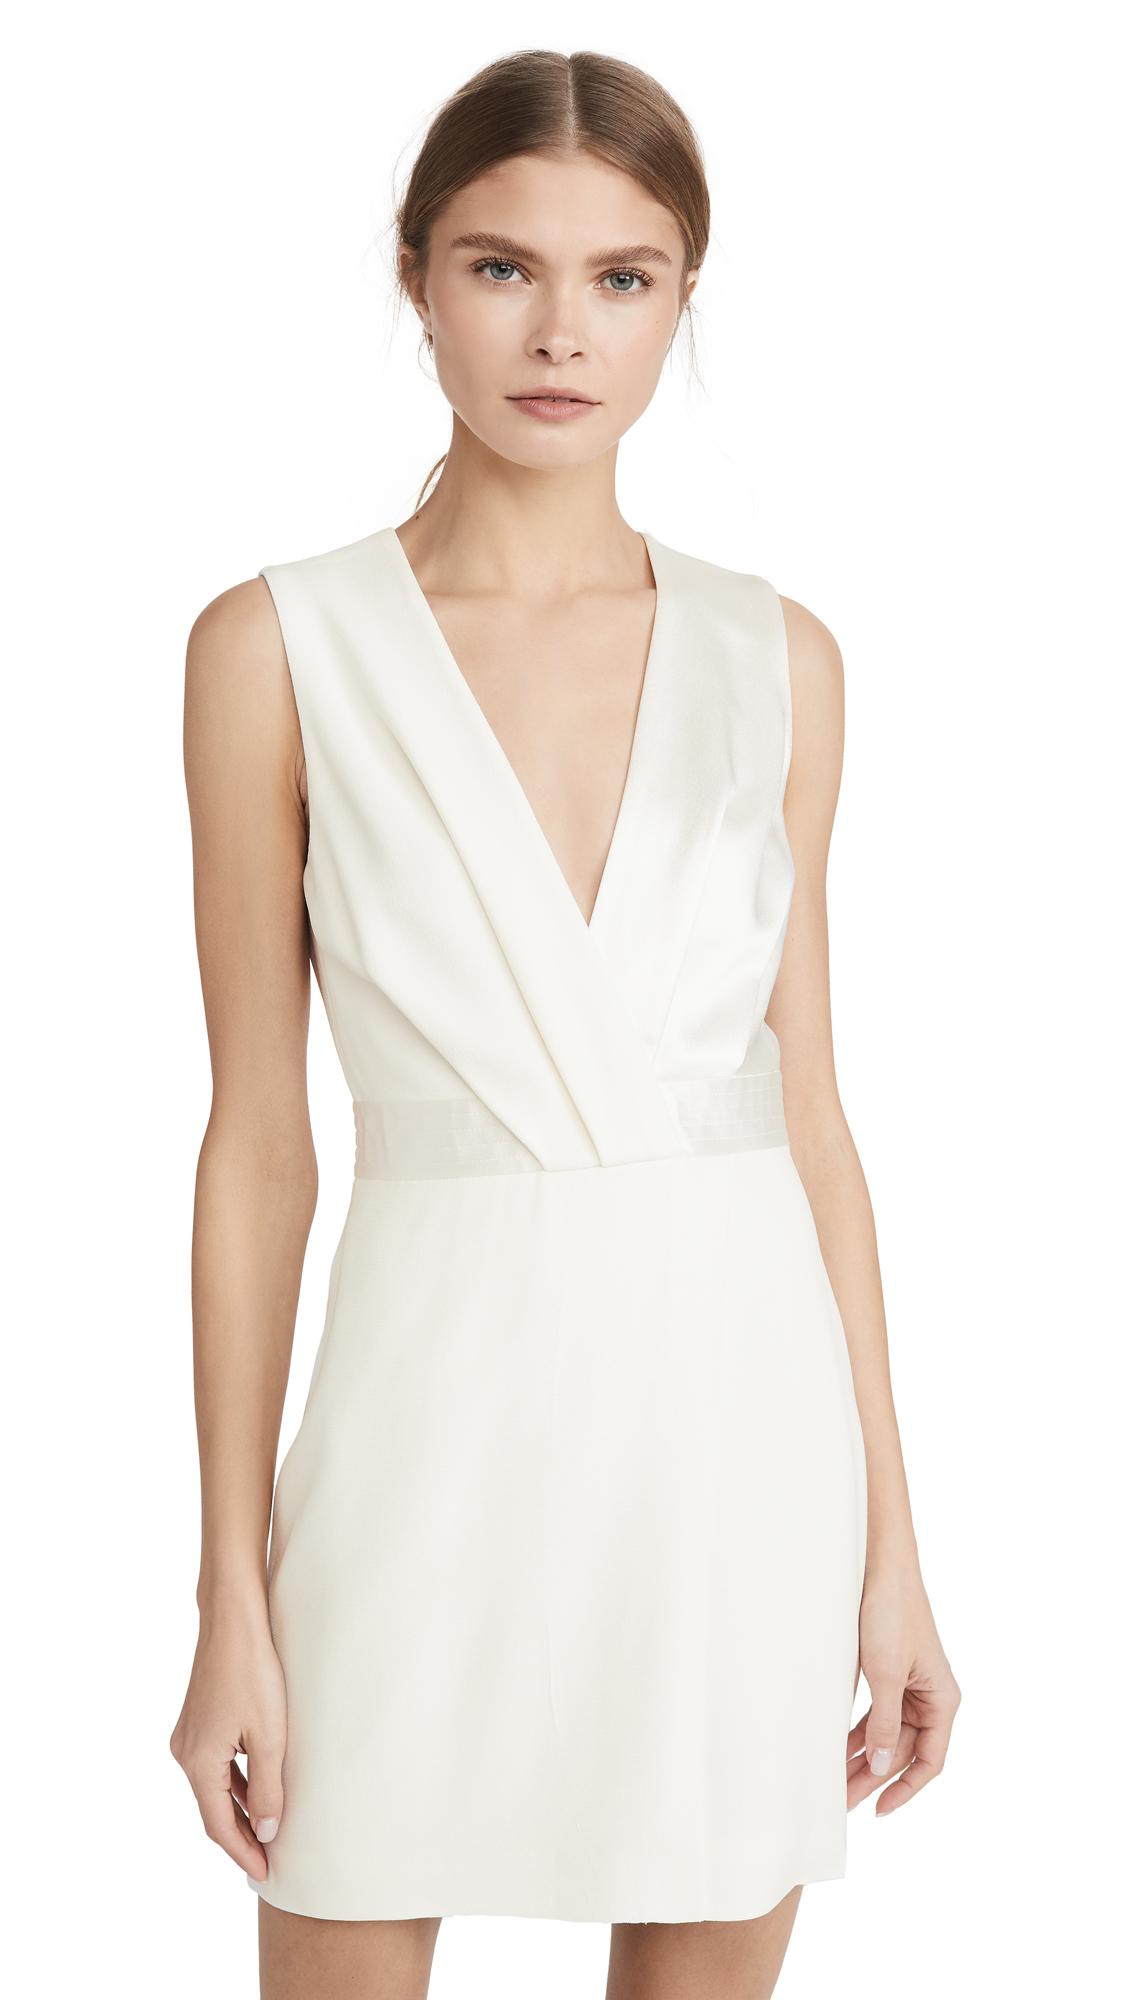 Dion Lee Pivot Drape Mini Dress - 40% Off Sale